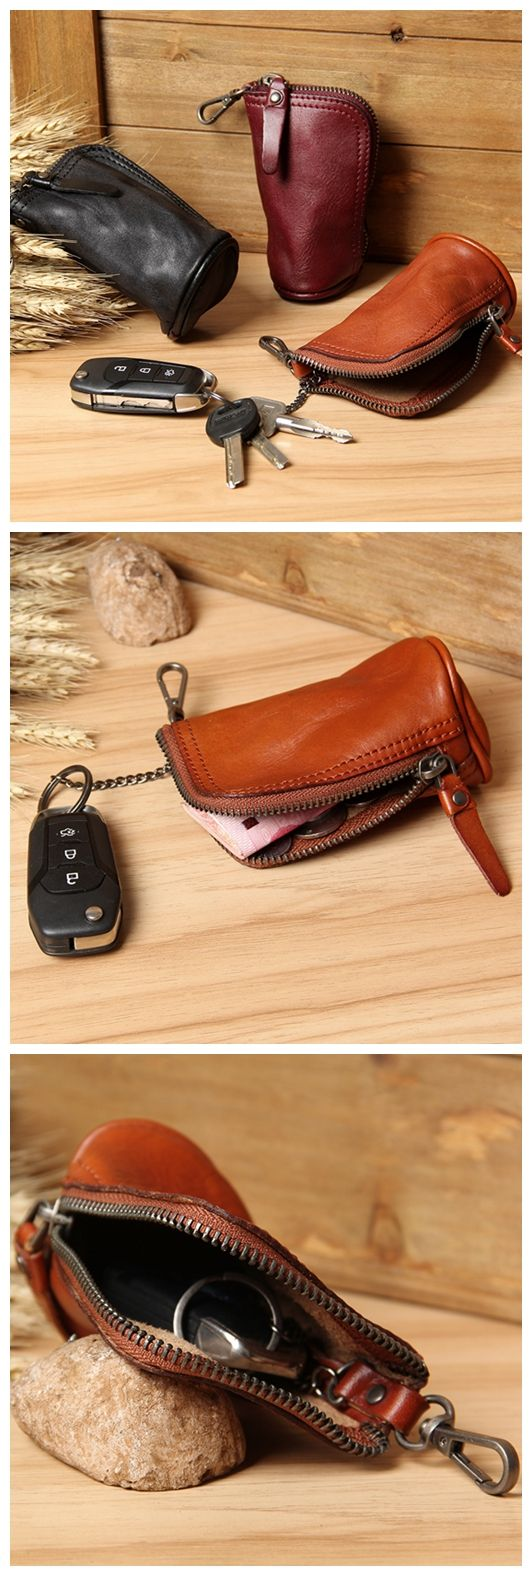 Handmade Genuine Leather Car Key Holder Leather Key Organizer Leather Key Chain Leather Case 2989 - Vintage Brown